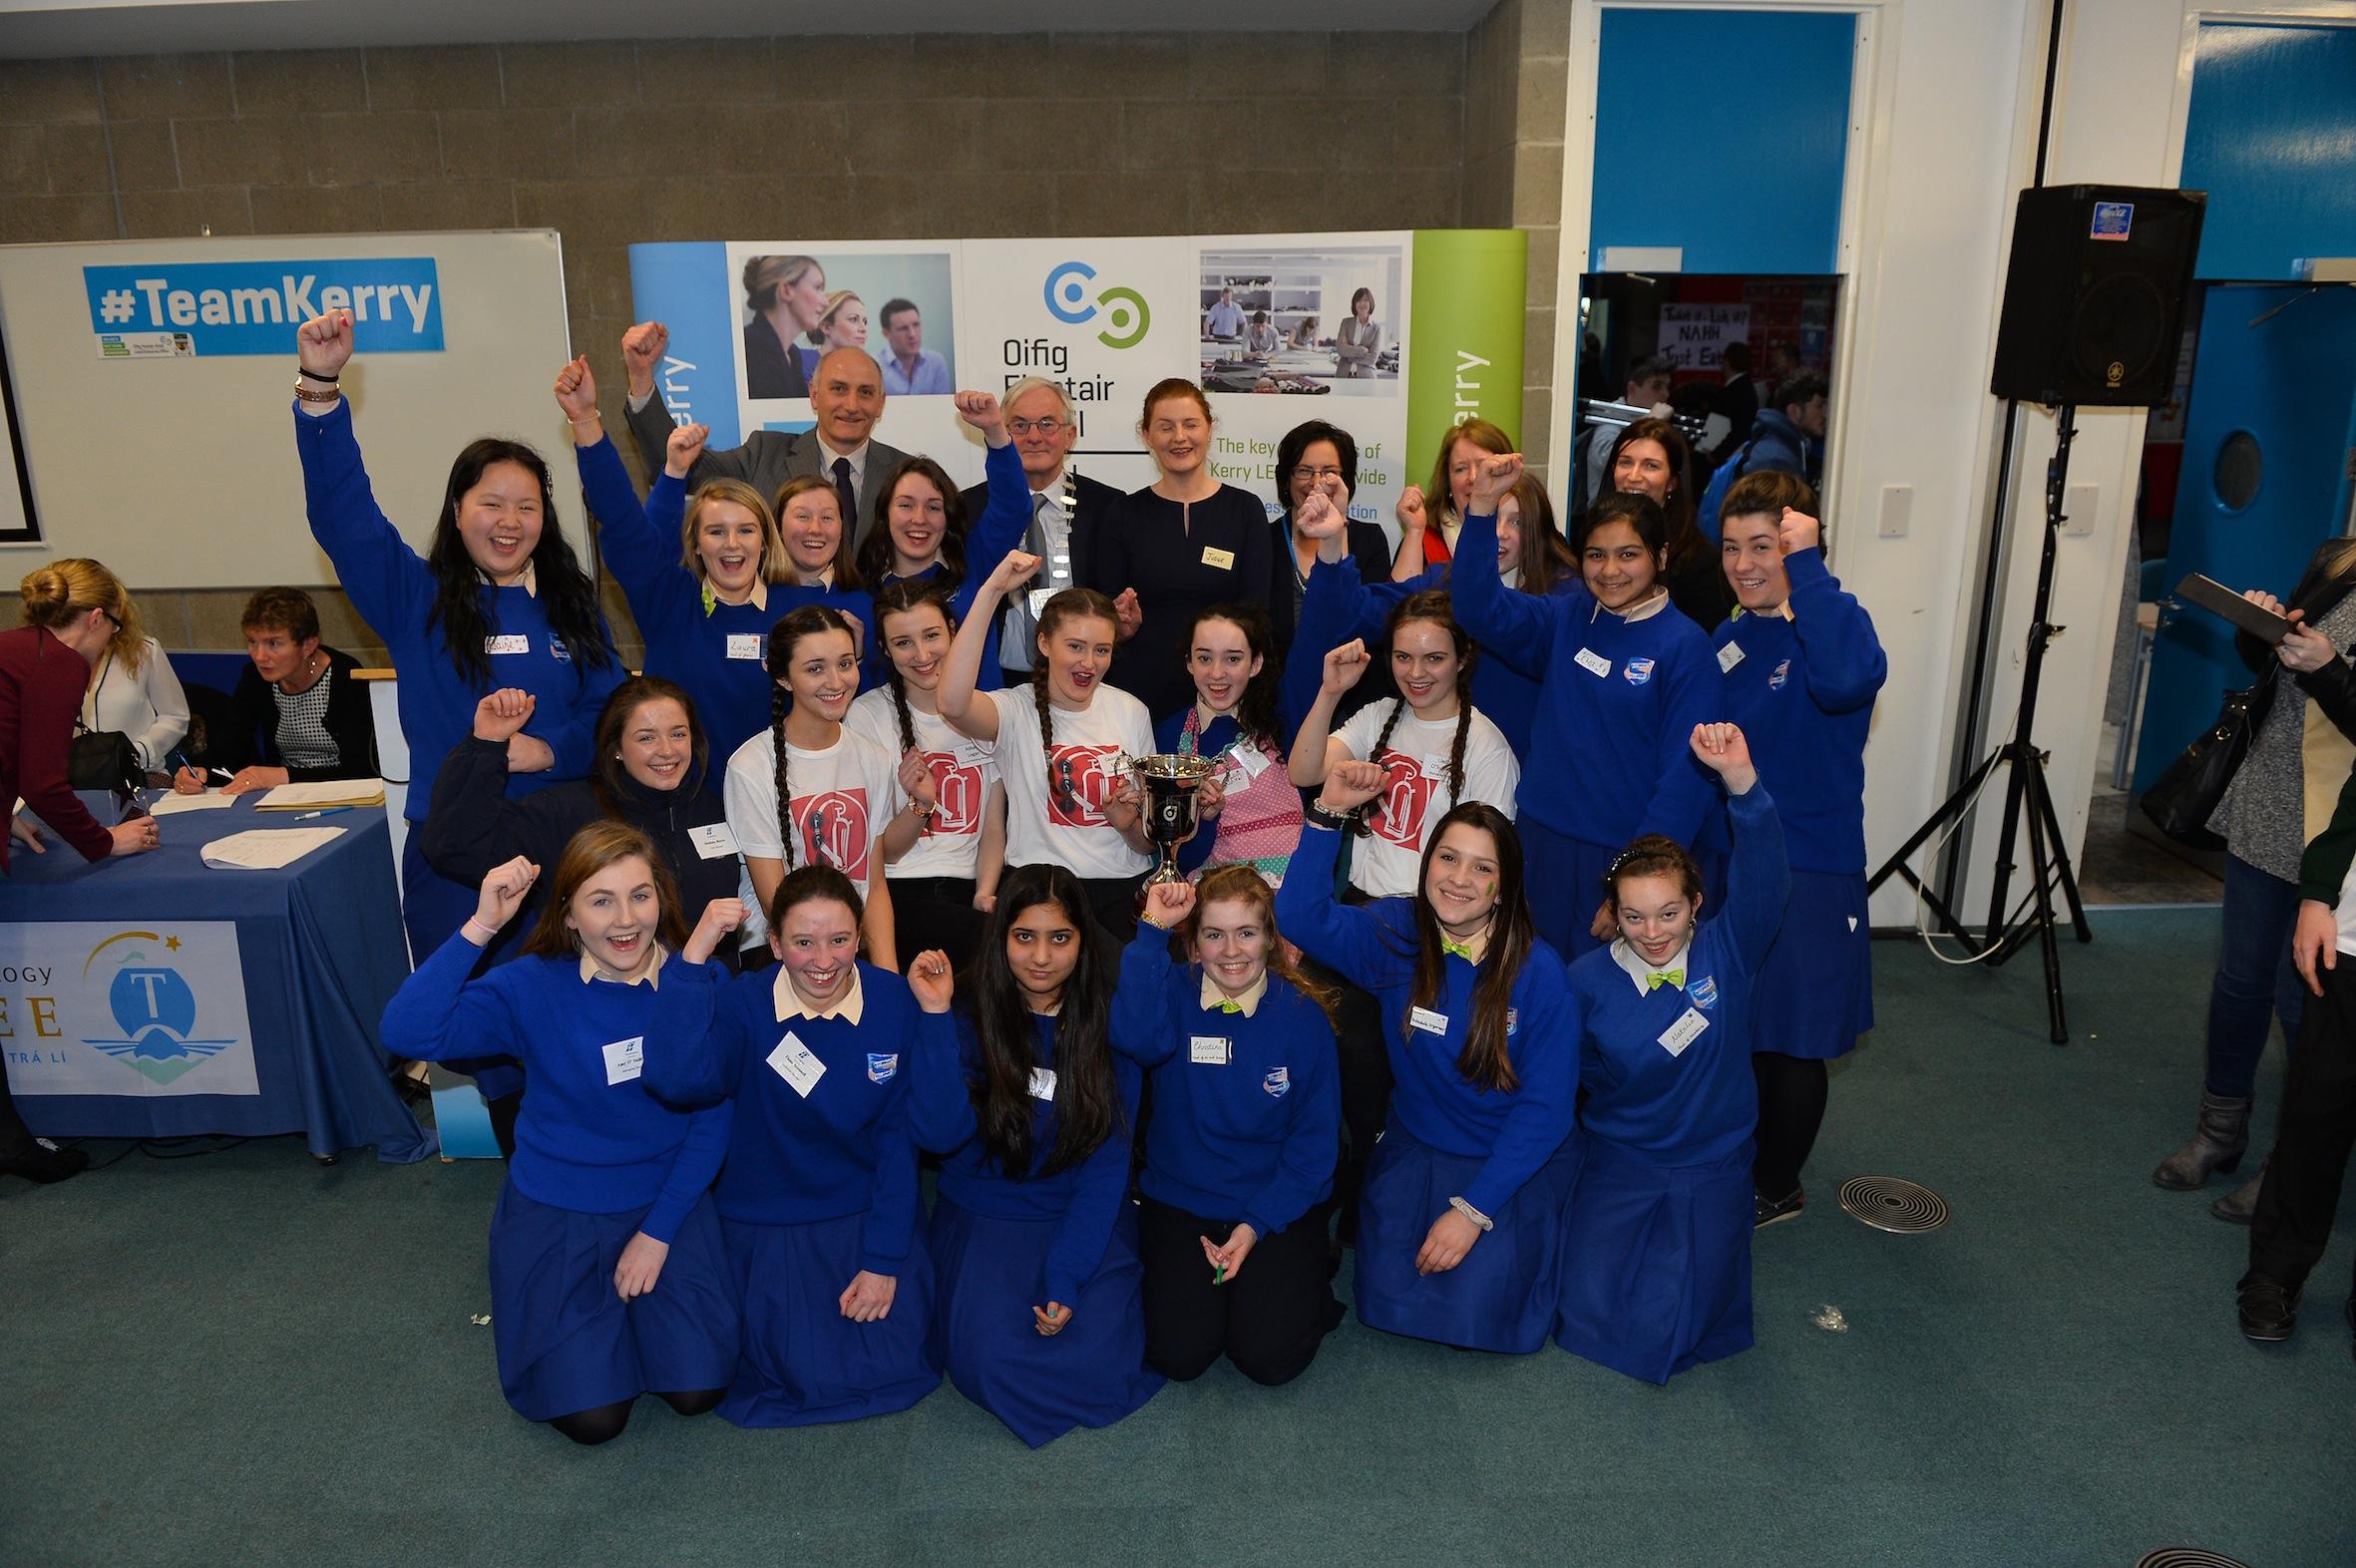 The St Brigid's Presentation Secondary School students who won the award for most enterprising school.